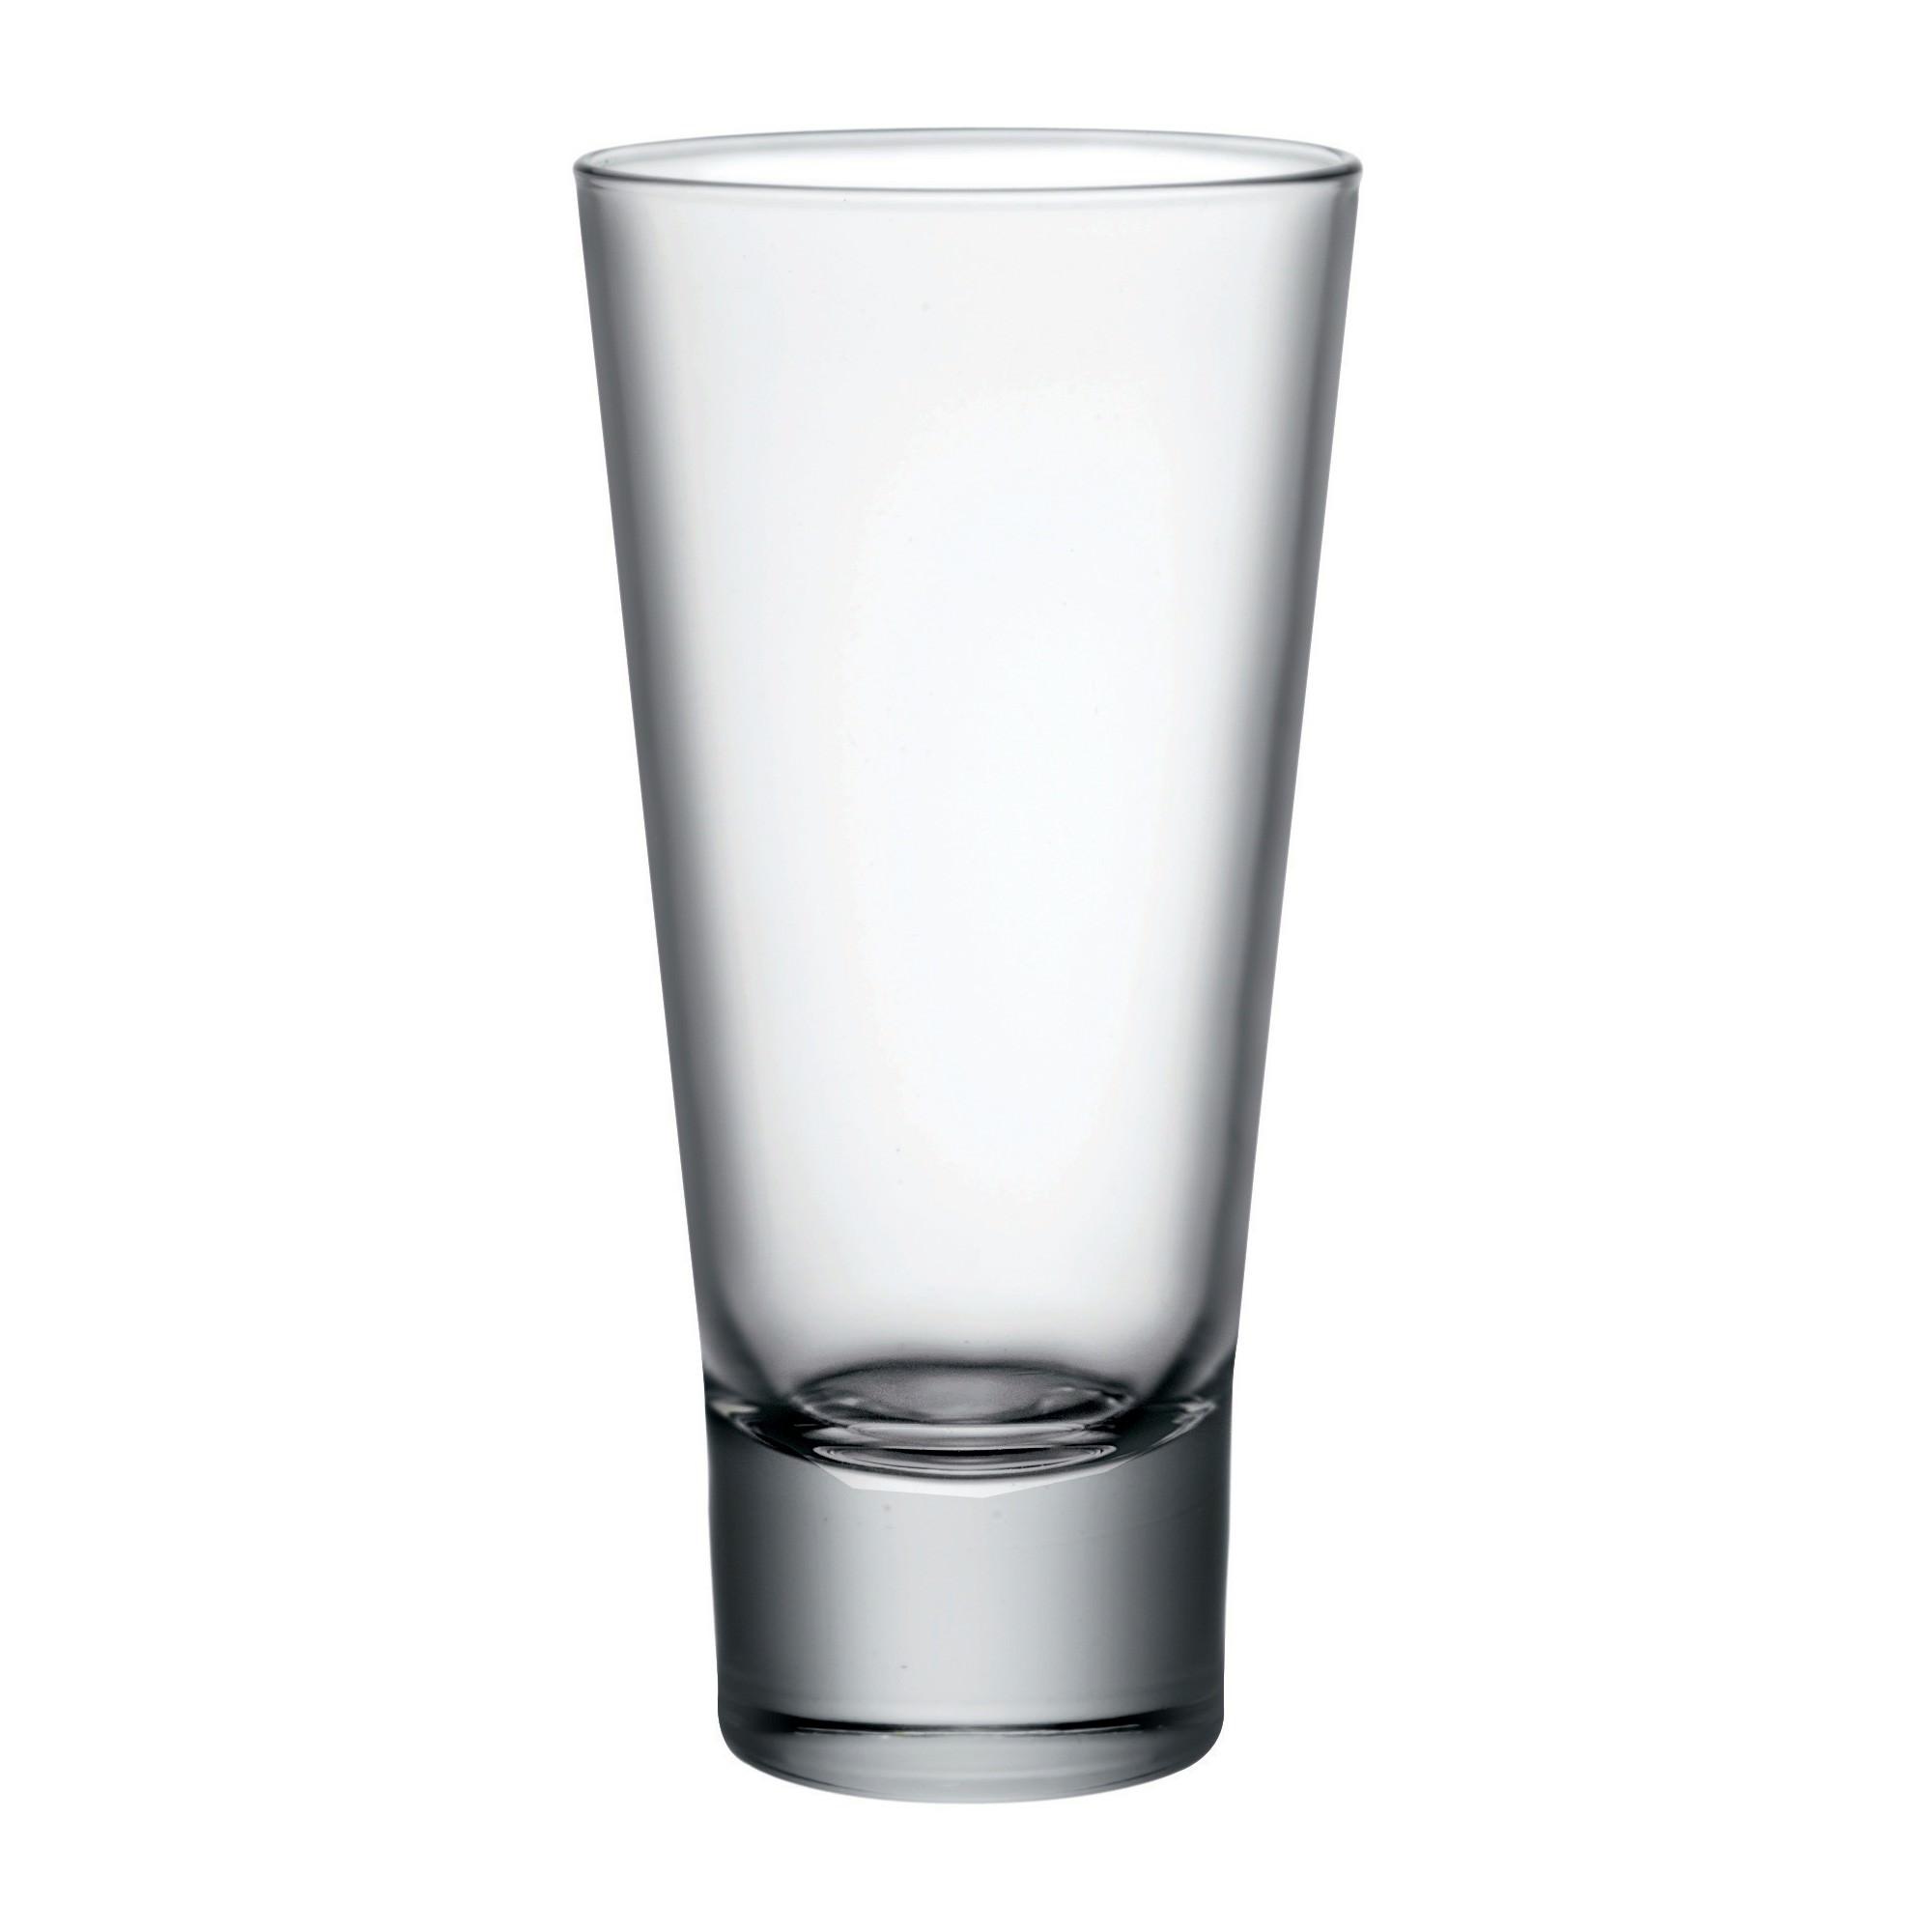 Bormioli Rocco Ypsilon High Ball Glasses, Set of 4